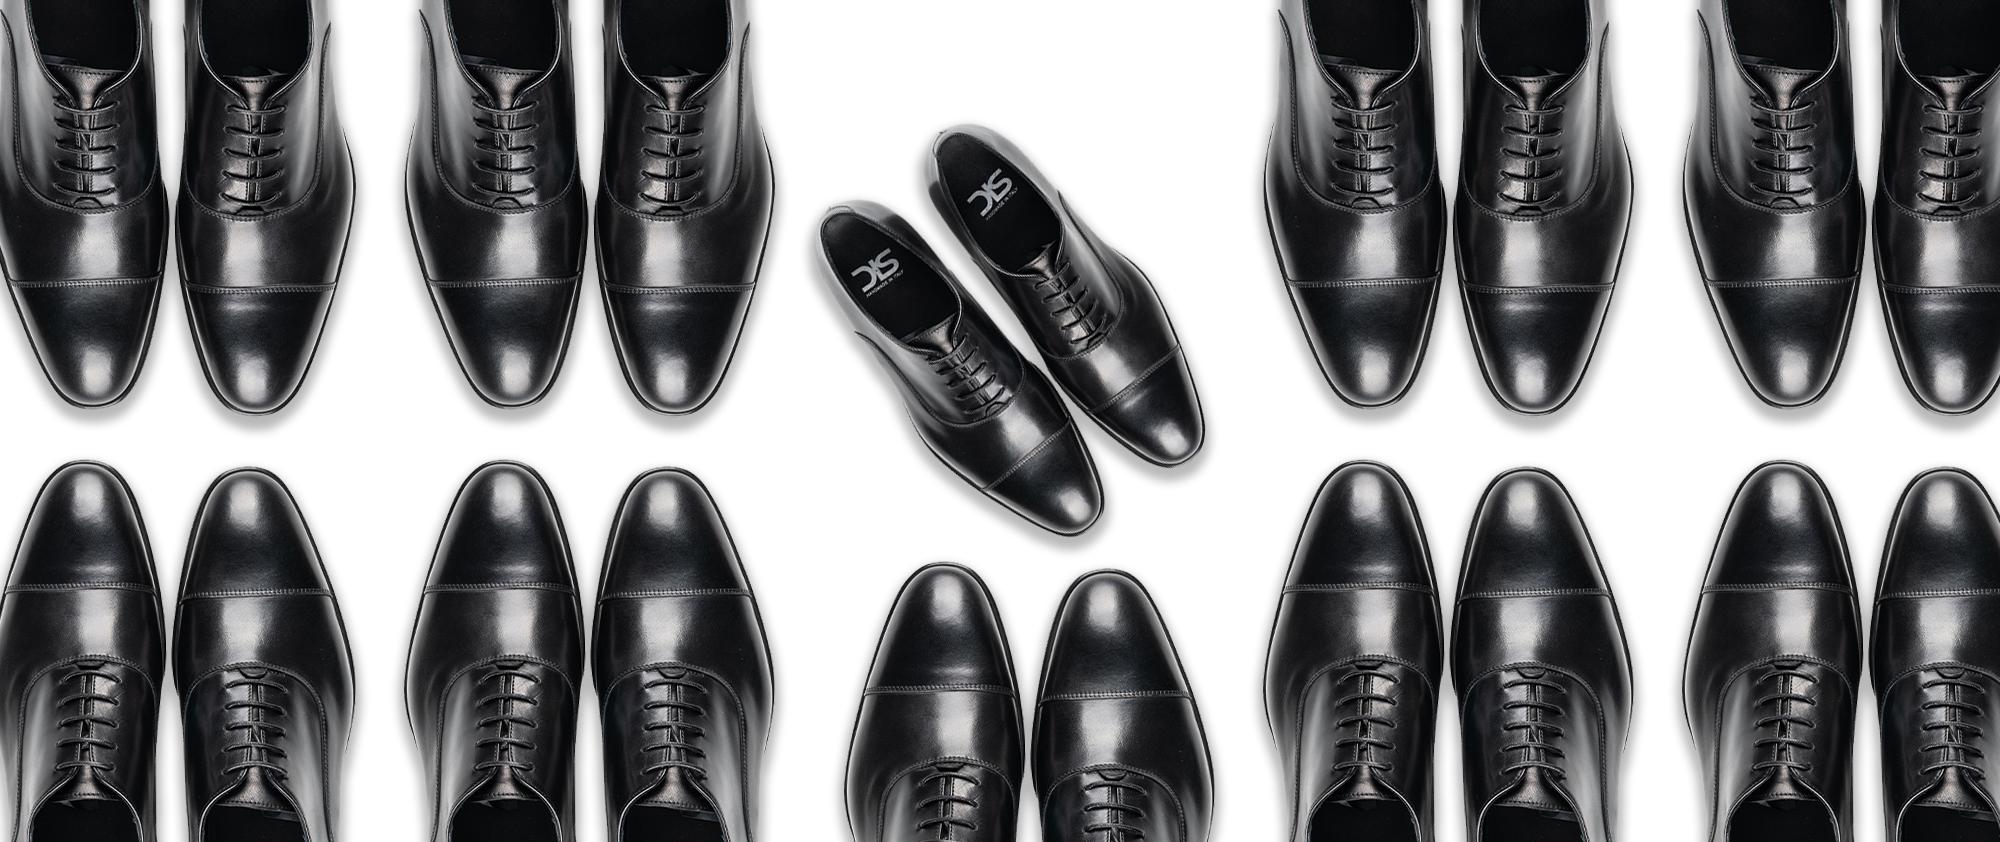 taglie piccole scarpe